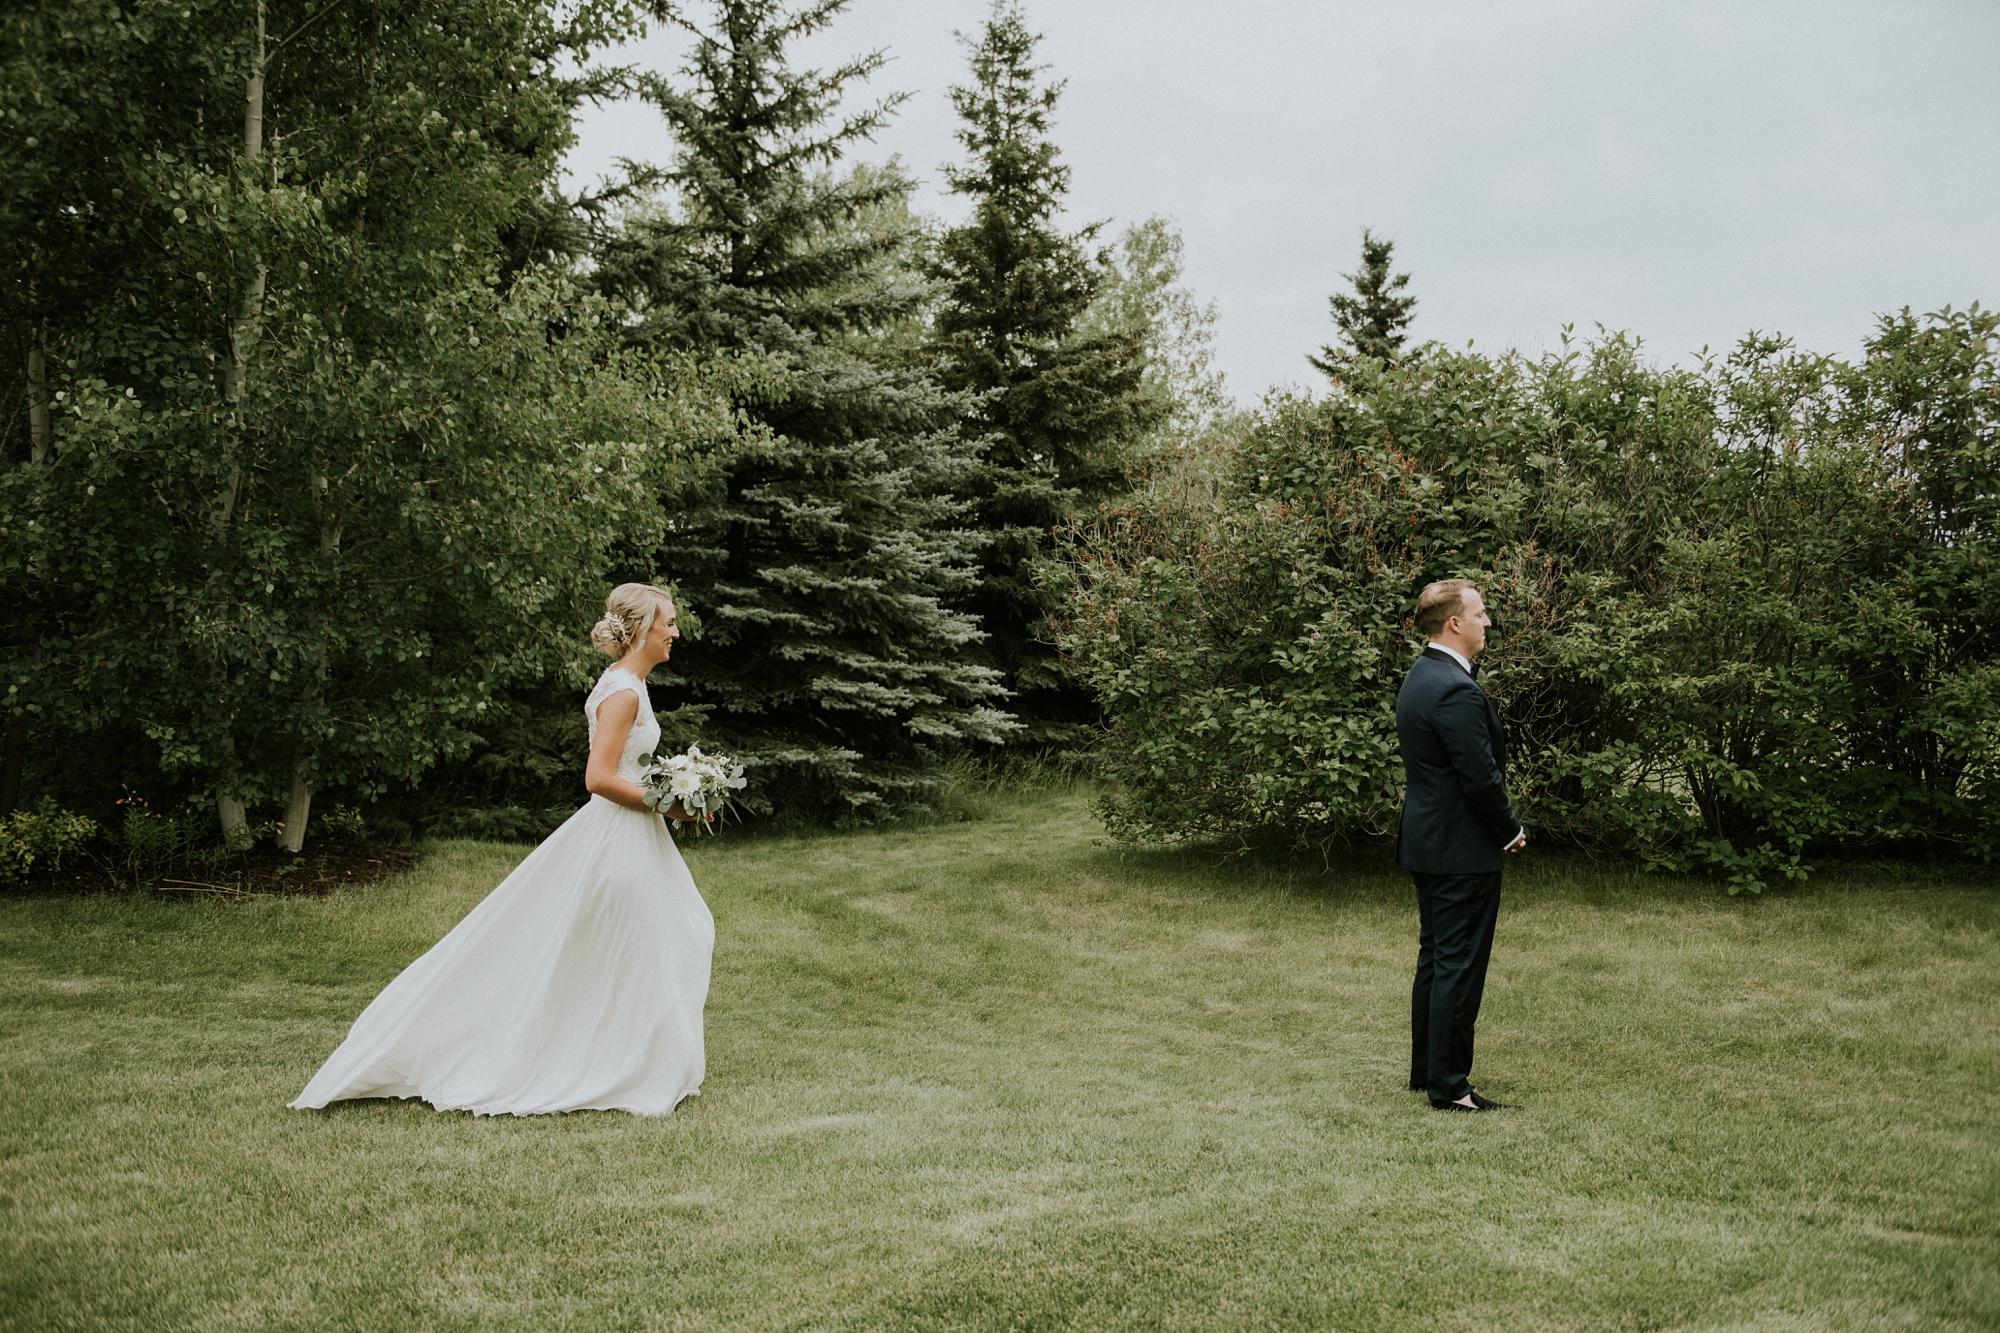 bride and groom first look images in calgary backyard wedding